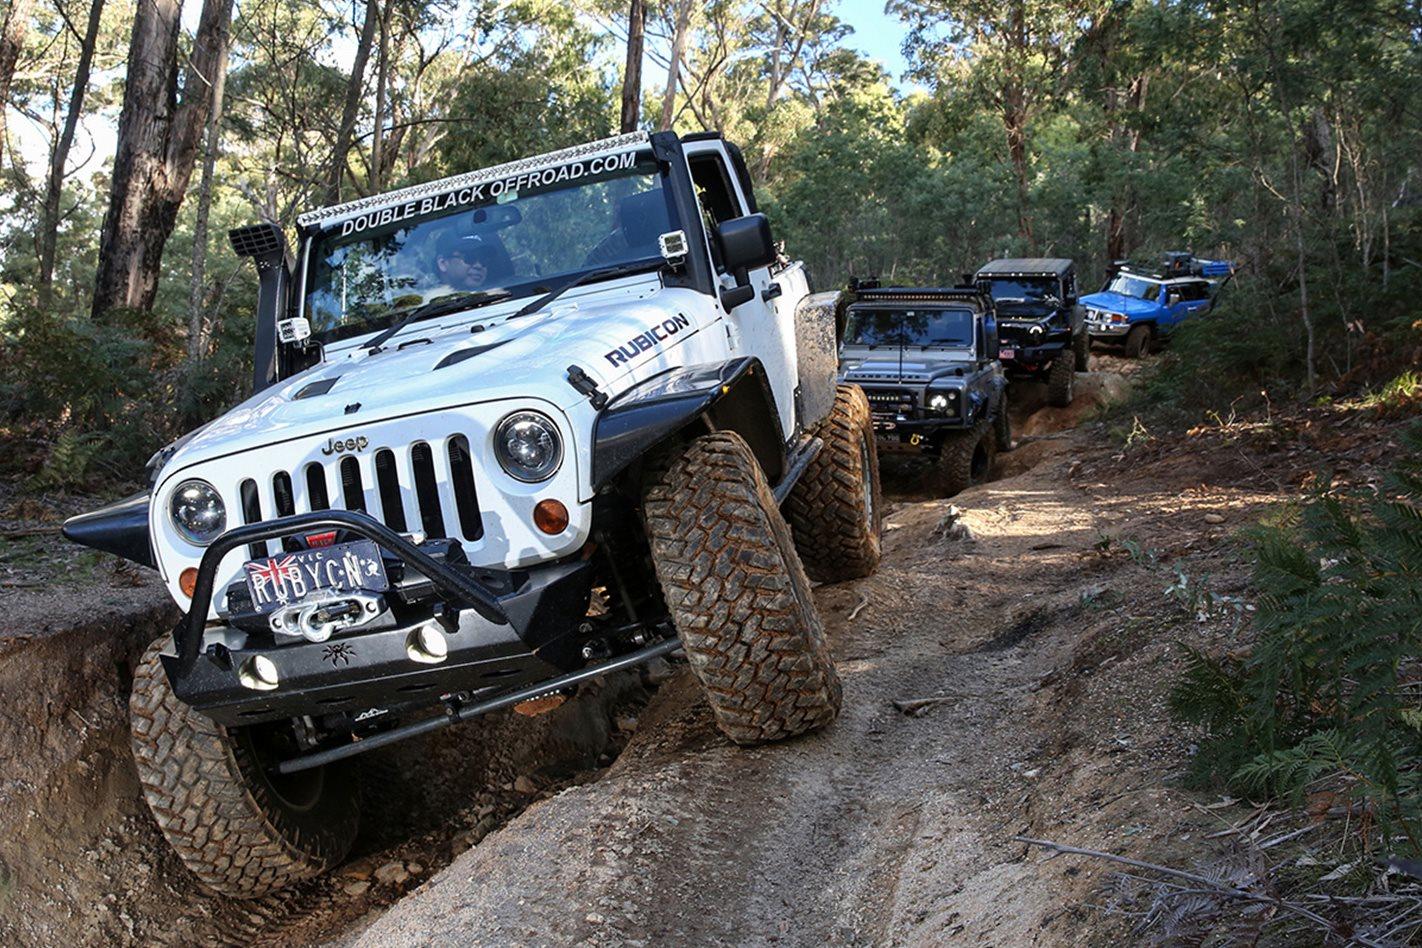 2013-Jeep-Wrangler-Rubicon-Double-Black-offroad-acorn-challenge.jpg